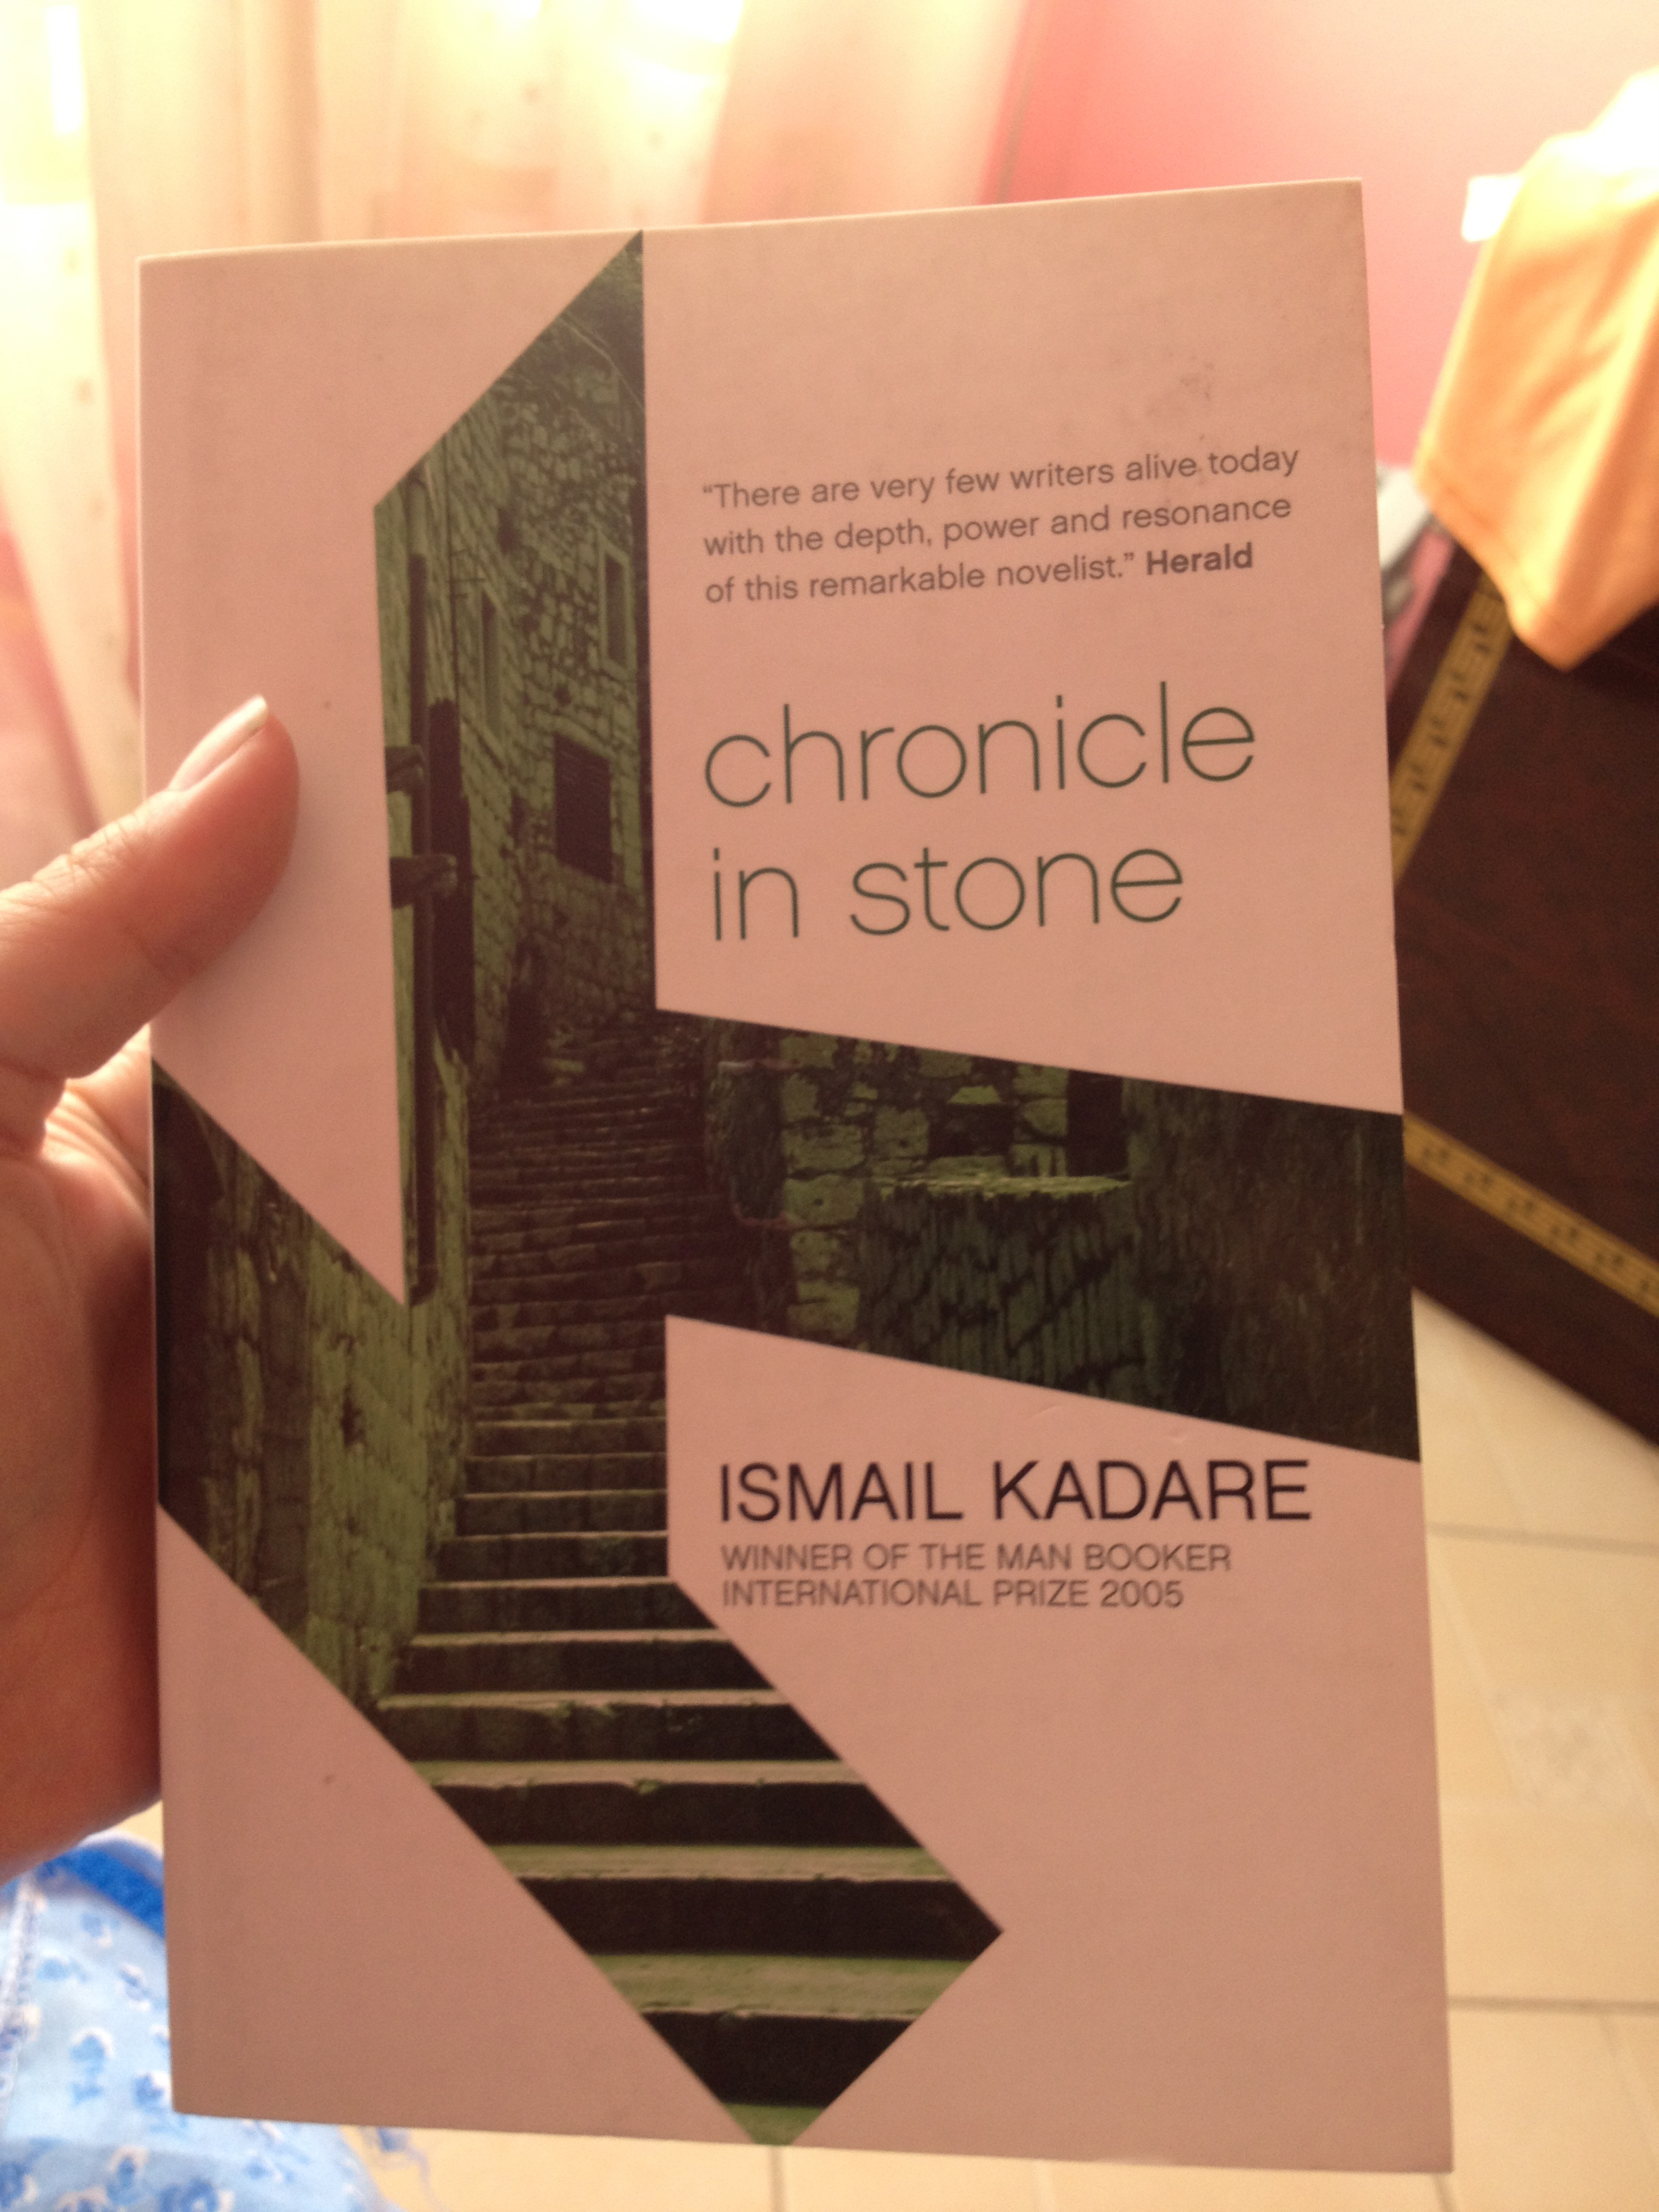 My Albanian read!